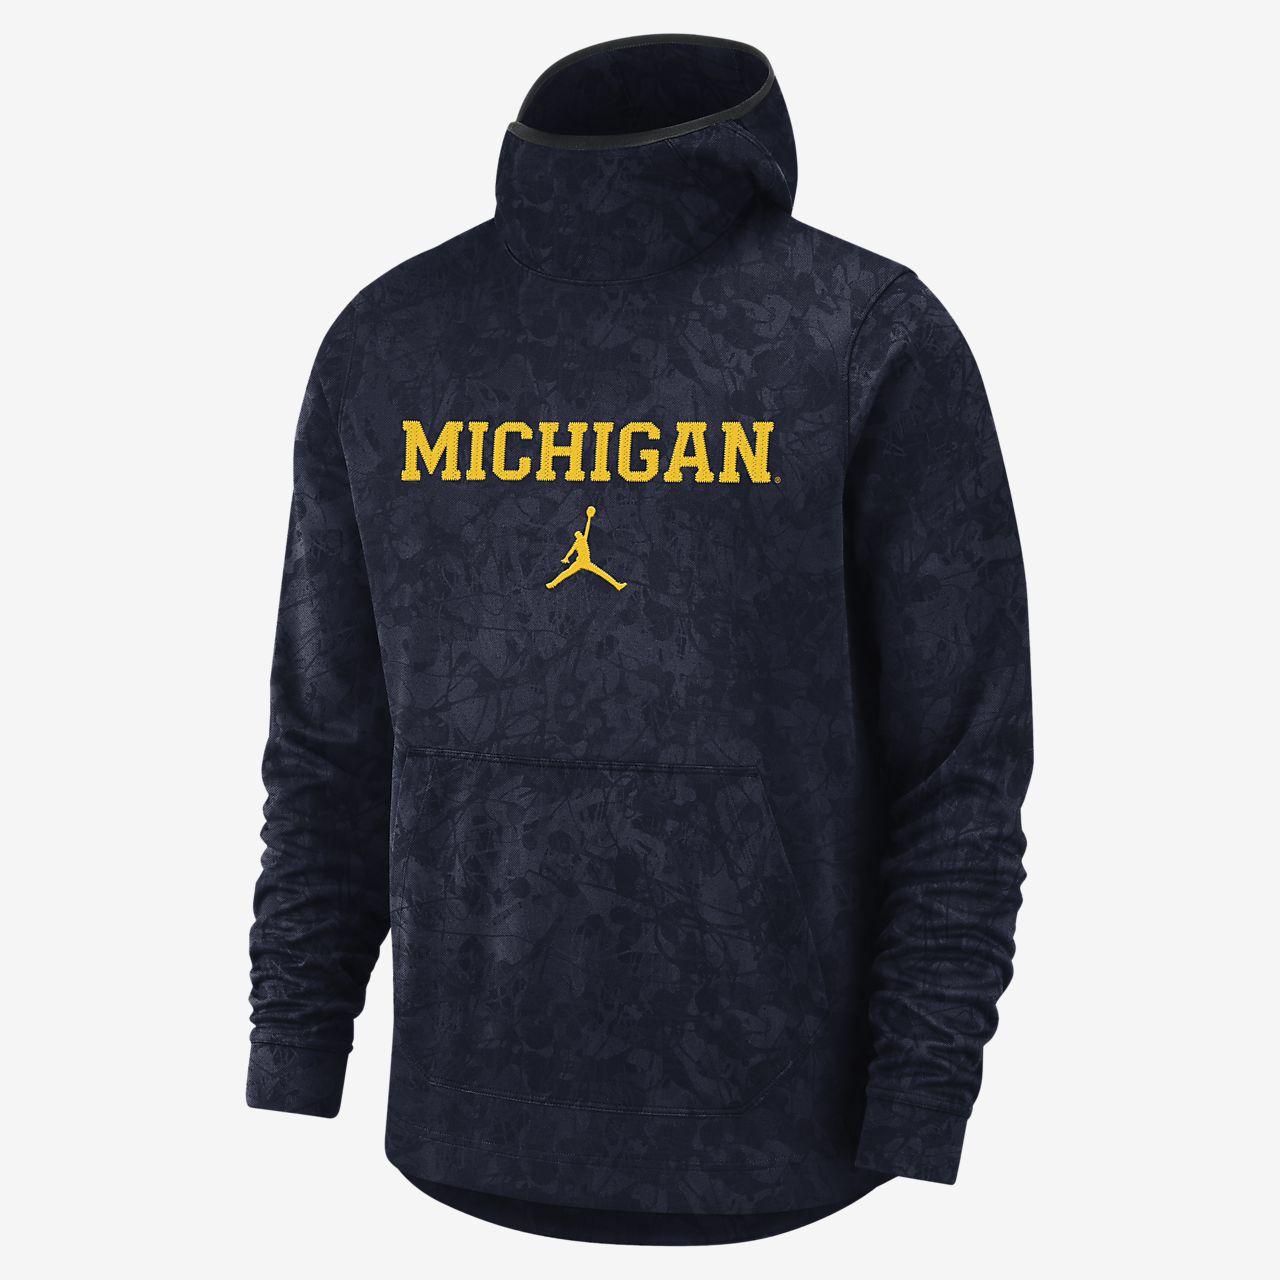 Jordan College Dri-FIT Spotlight (Michigan) Men's Pullover Hoodie